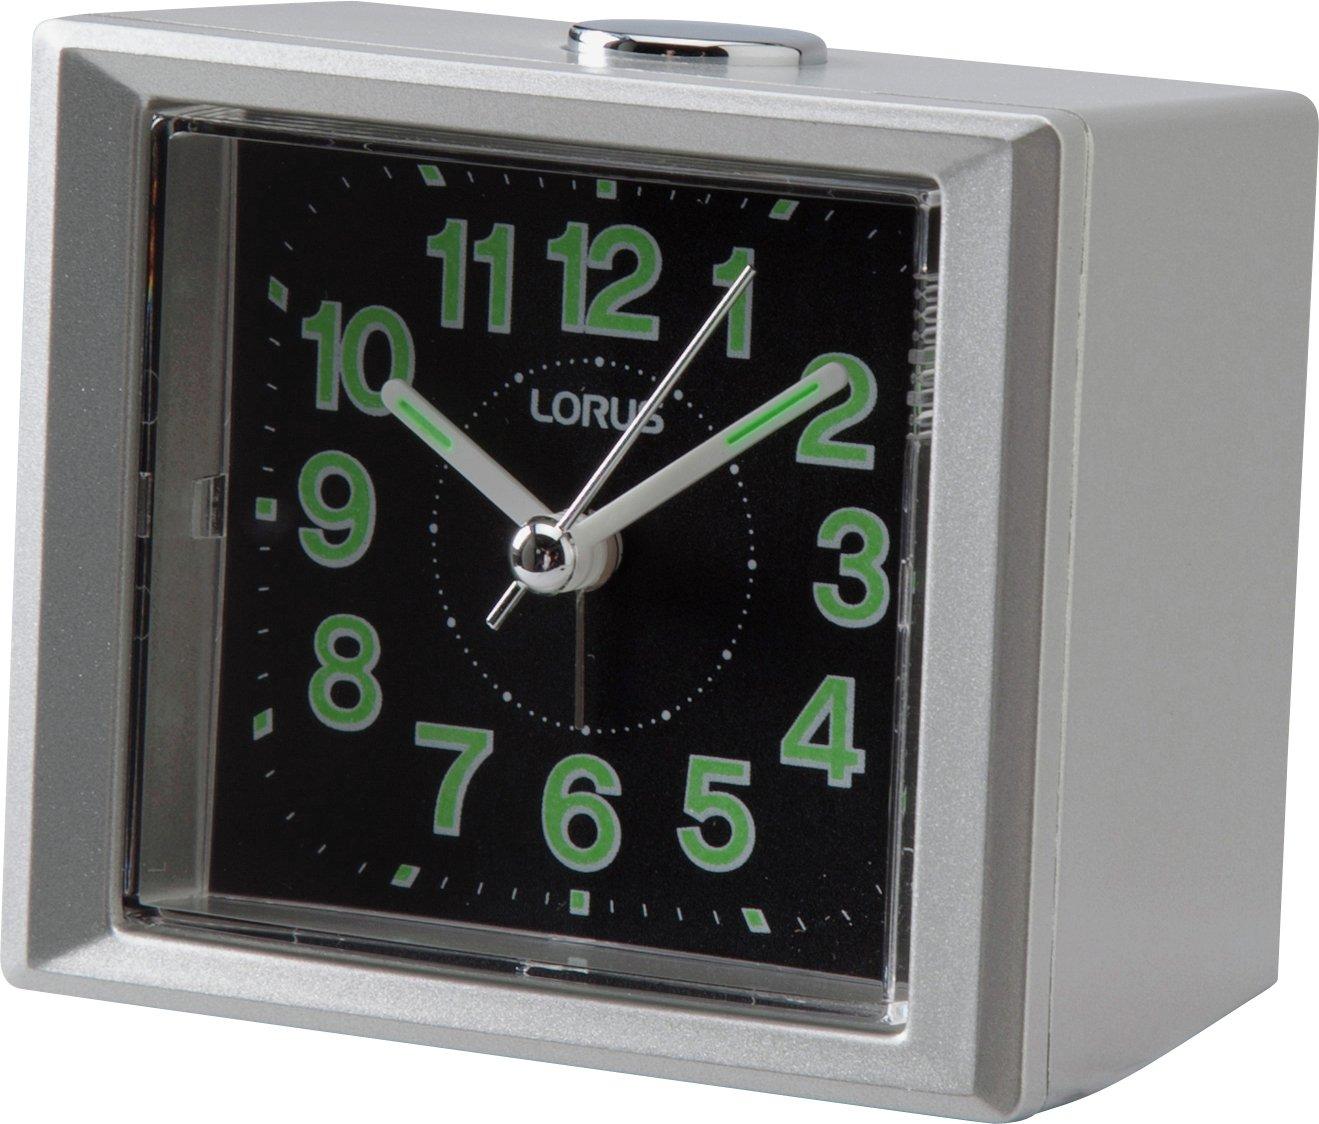 lorus sweeper alarm clock gay times uk. Black Bedroom Furniture Sets. Home Design Ideas